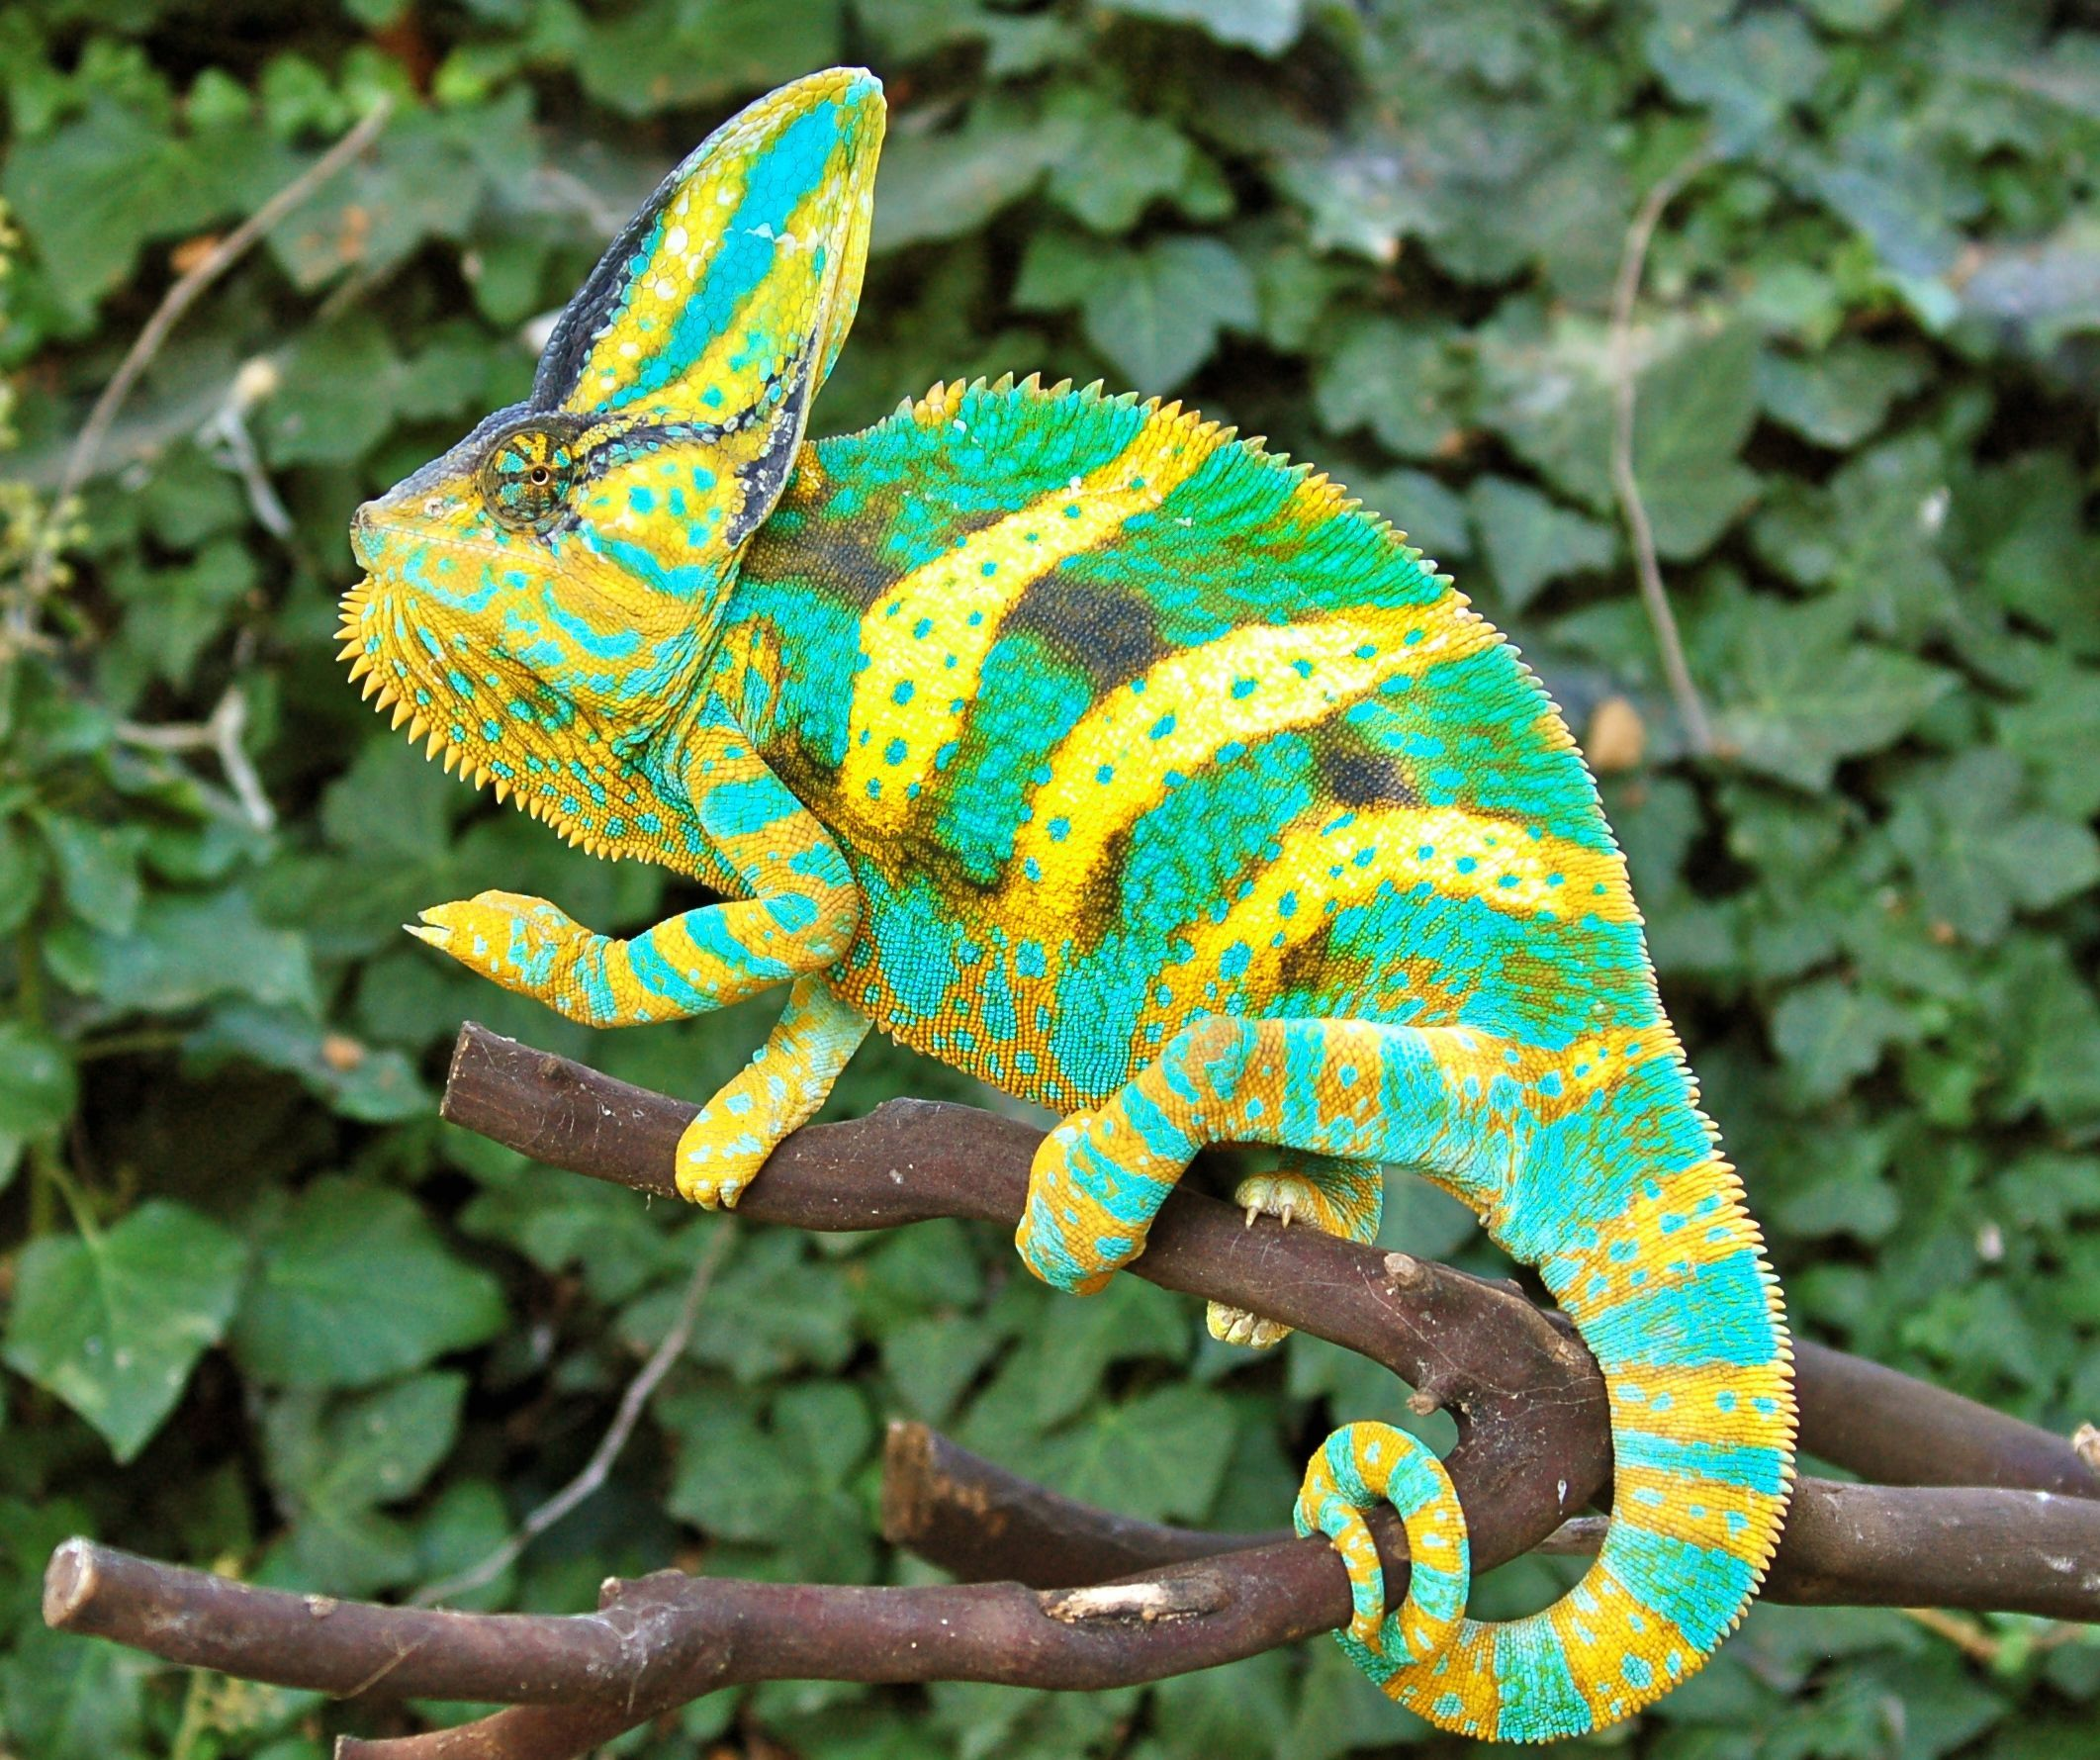 Premium High Color Baby Veiled Chameleons For Sale Online ...